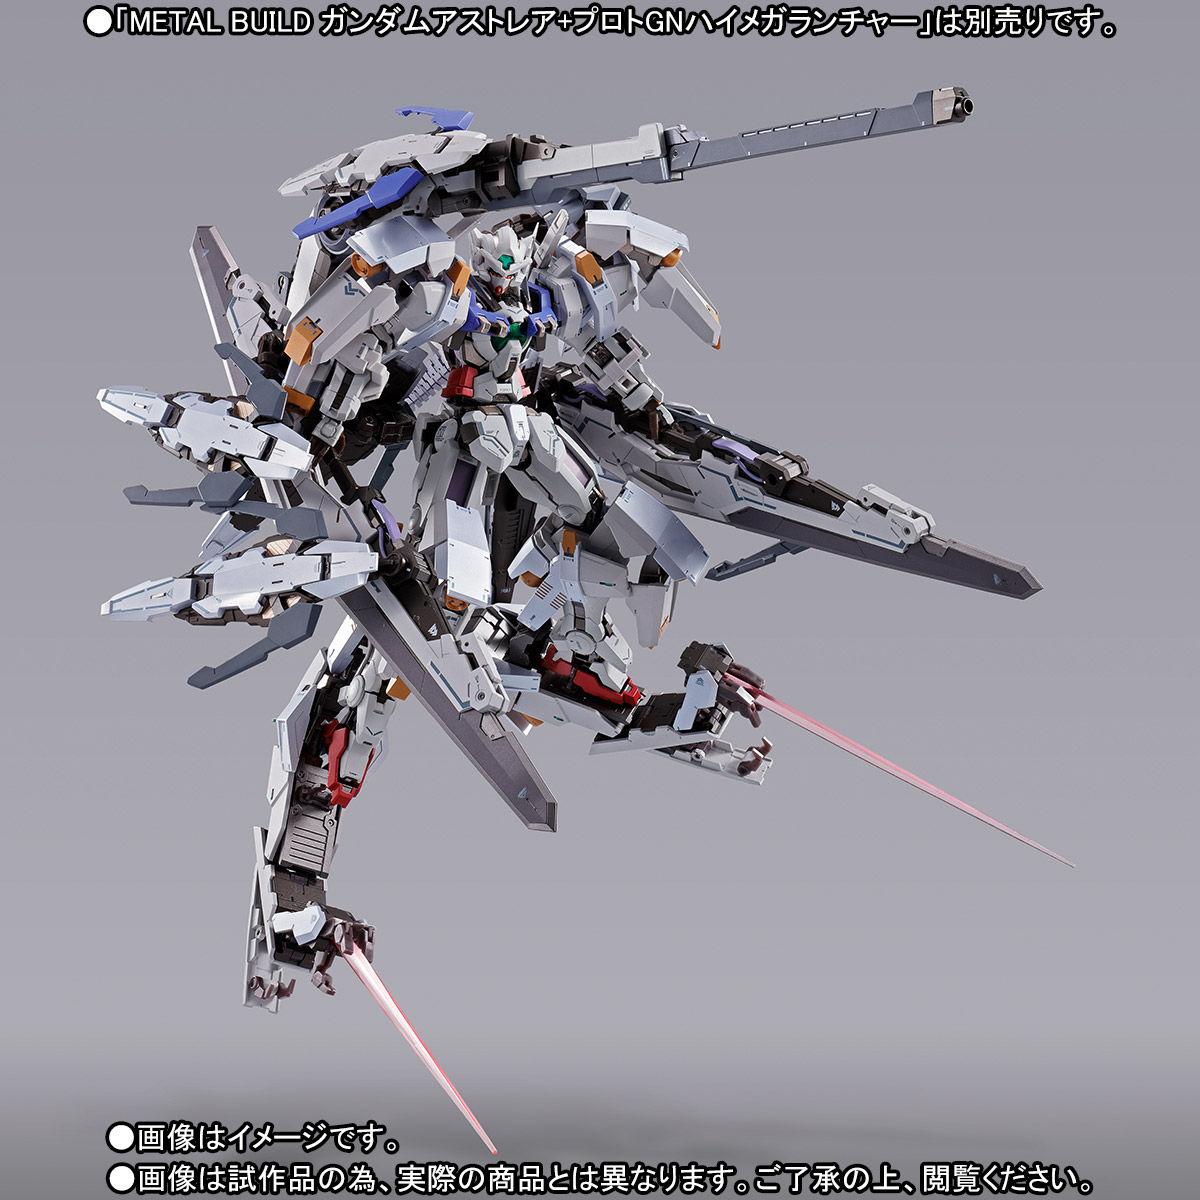 P-Bandai METAL BUILD Gundam Astraea High Mobility Test Equipment (用高機動試験装備)